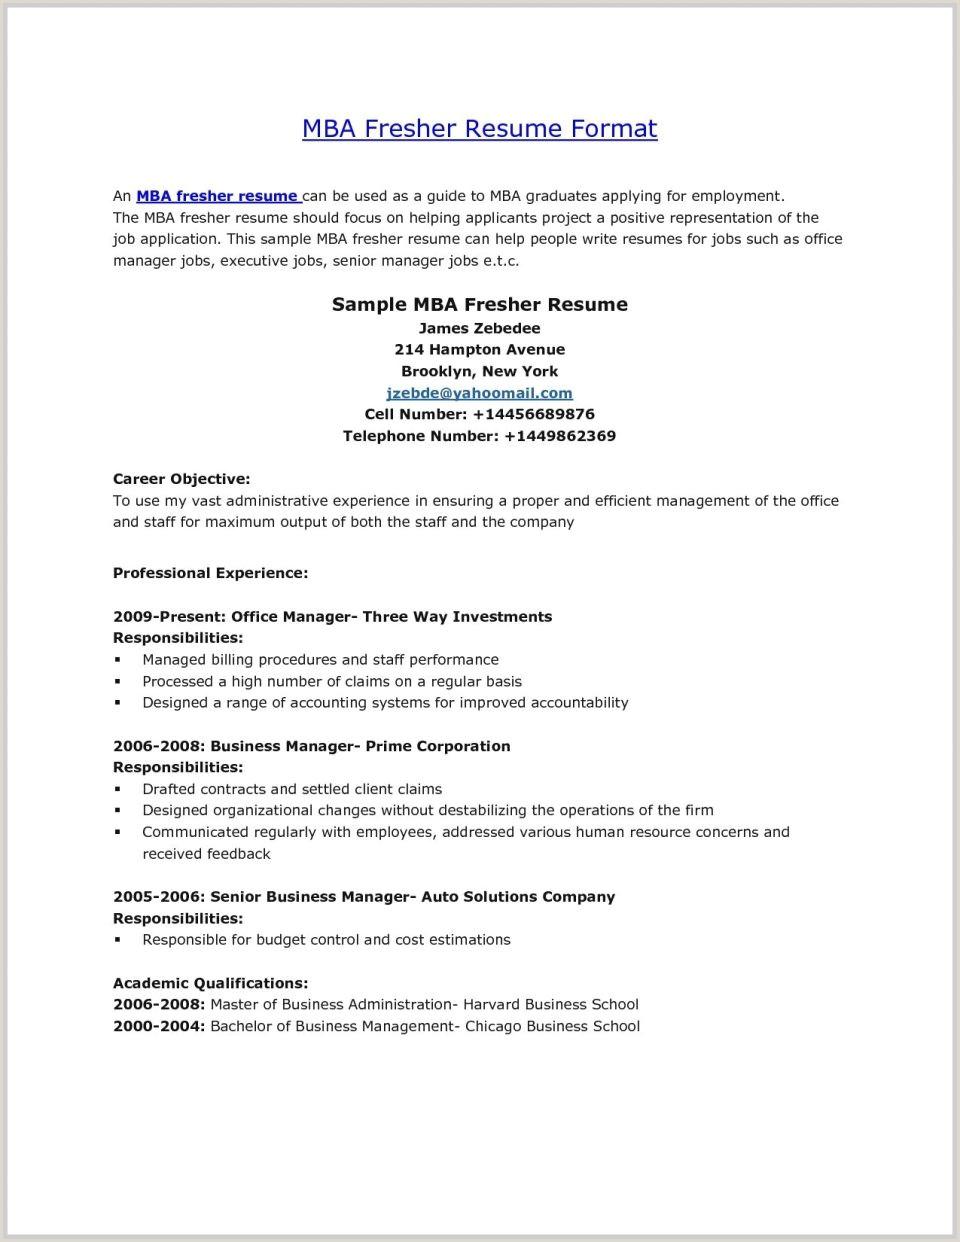 Fresher Resume format Mba Hairstyles Mba Resume Sample Harvard Winning Marketing